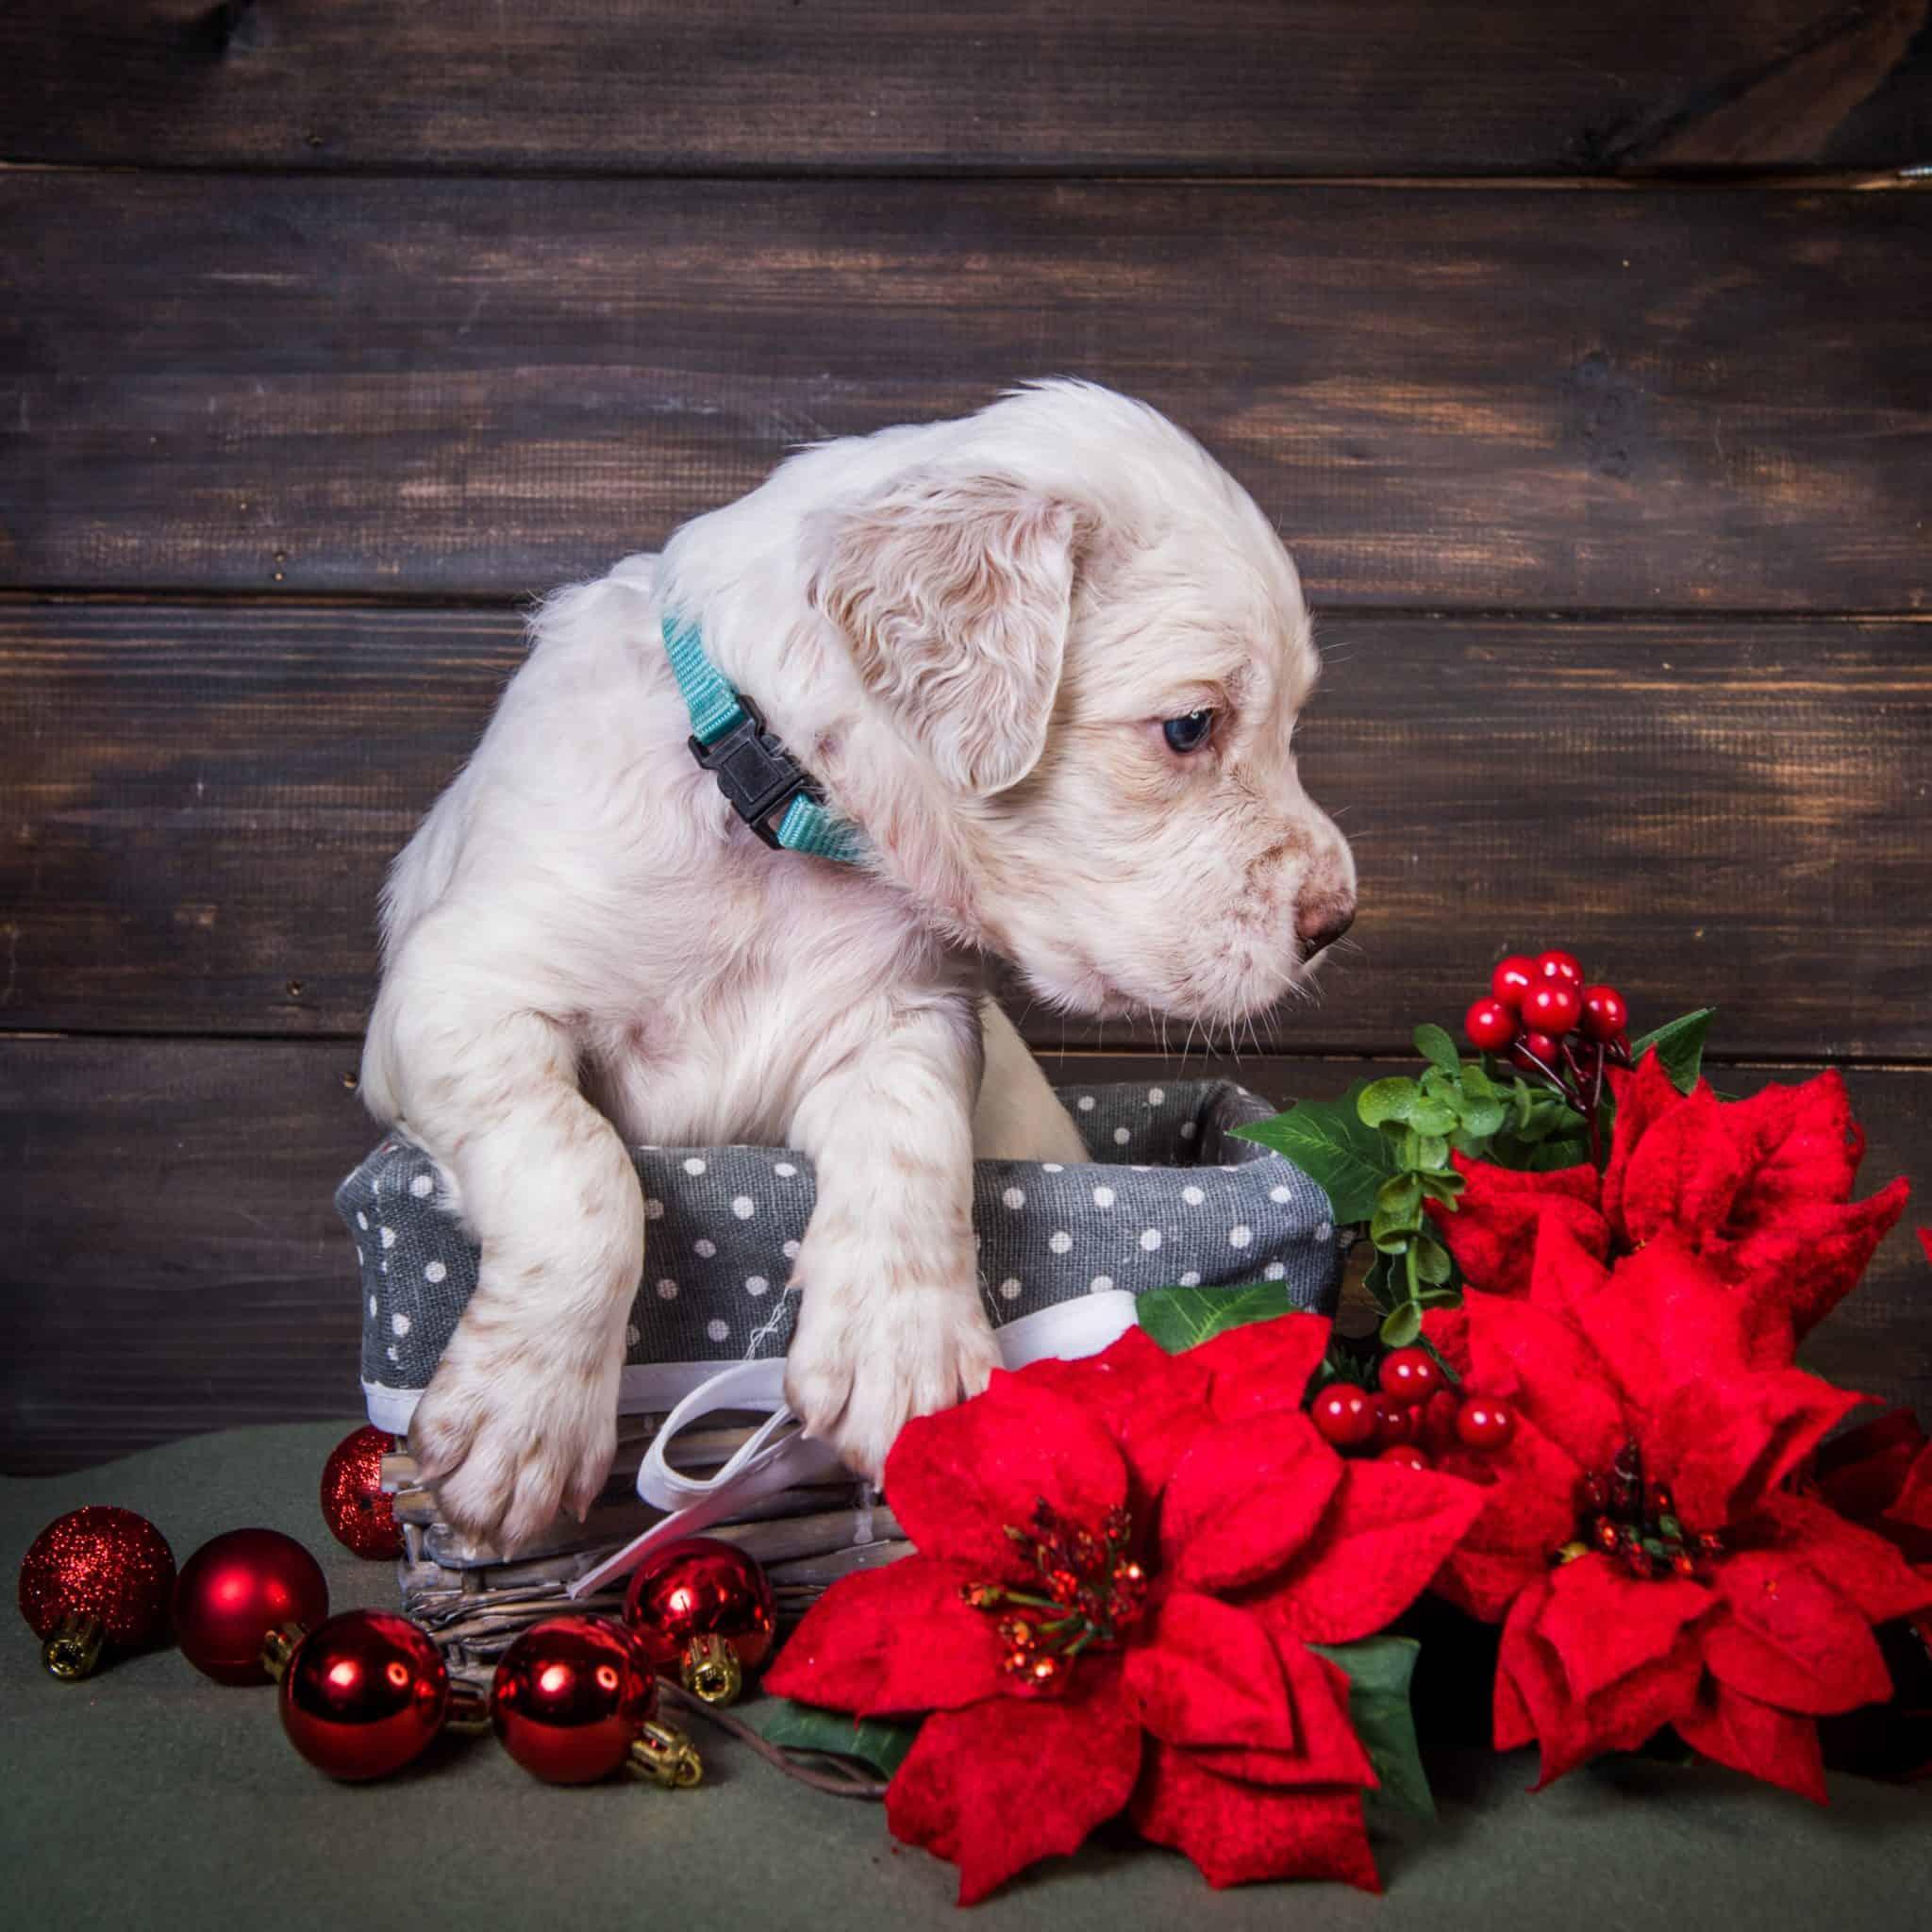 Are Poinsettias Poisonous To Dogs